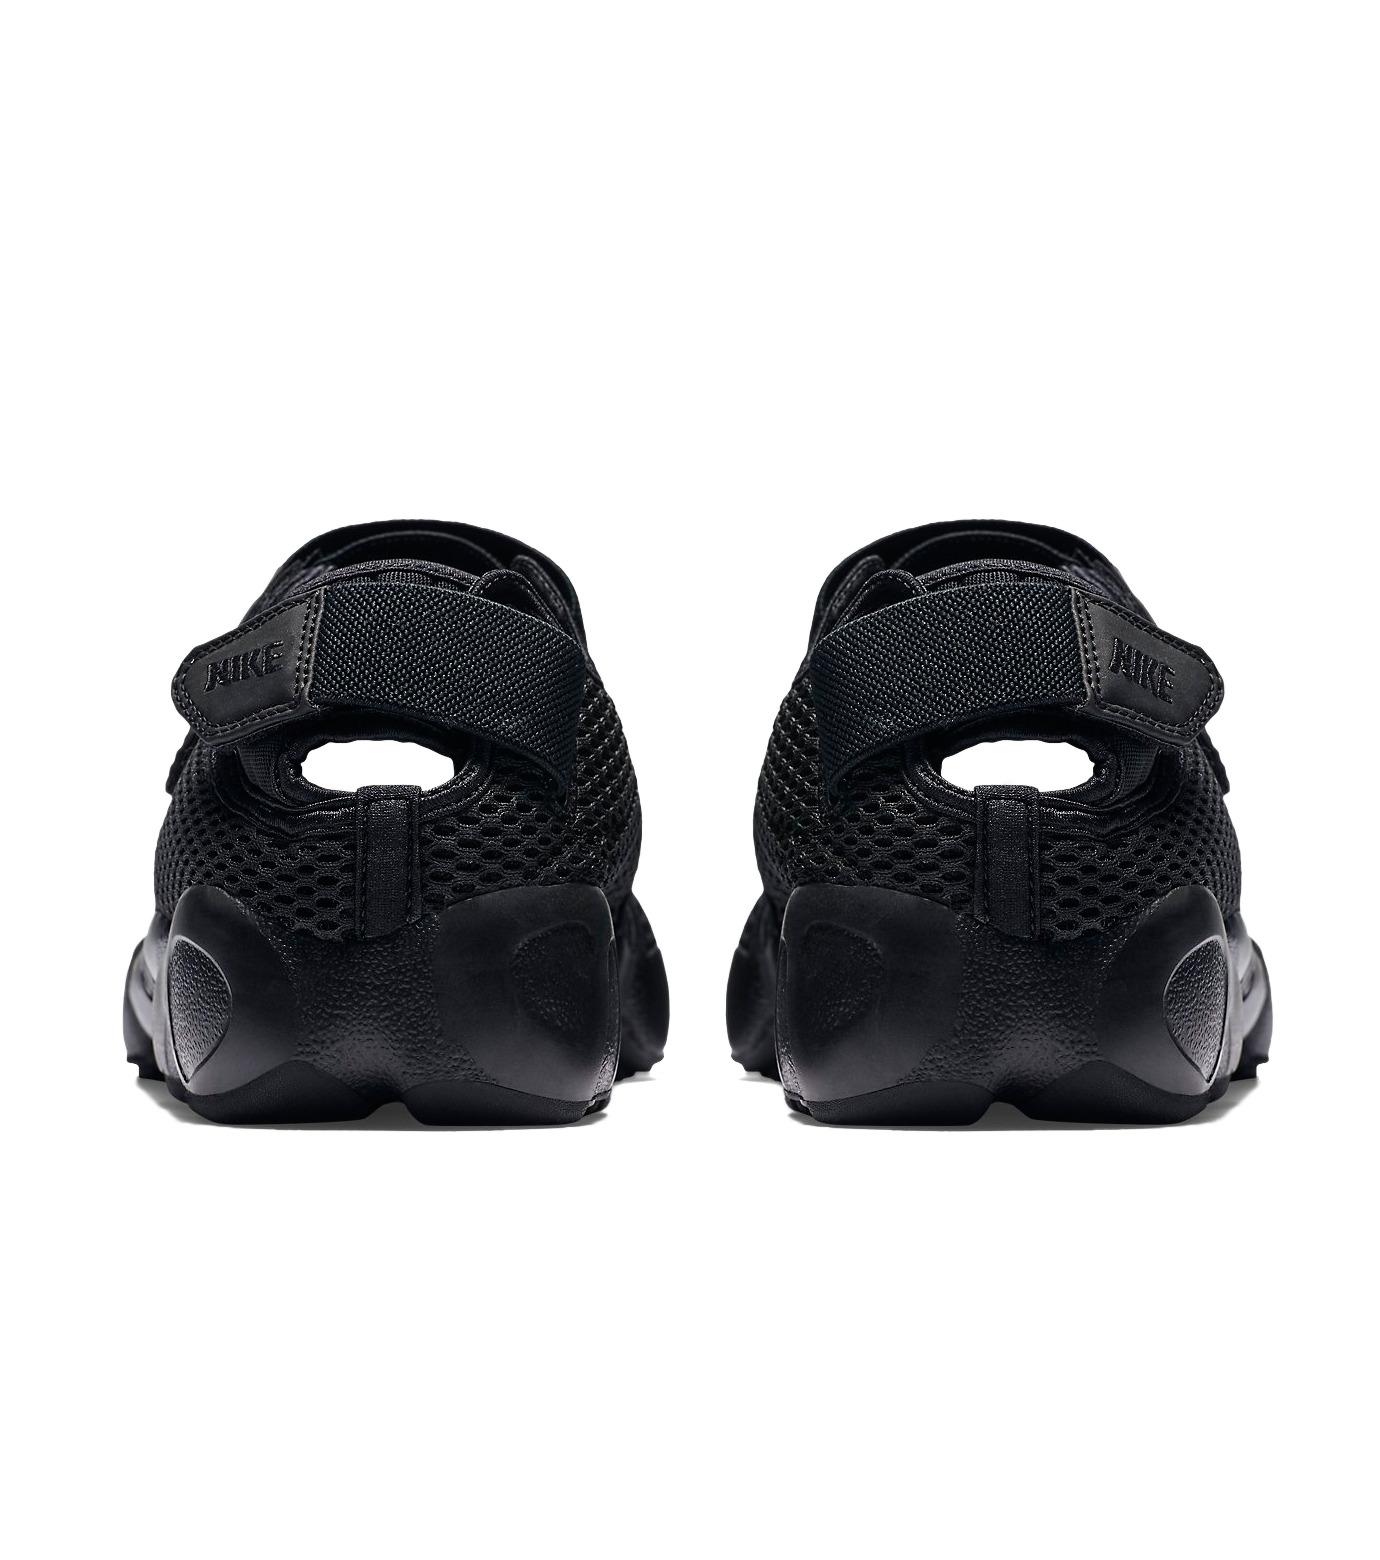 NIKE(ナイキ)のAir Rift Breathe-BLACK(シューズ/shoes)-847609-001-13 拡大詳細画像6